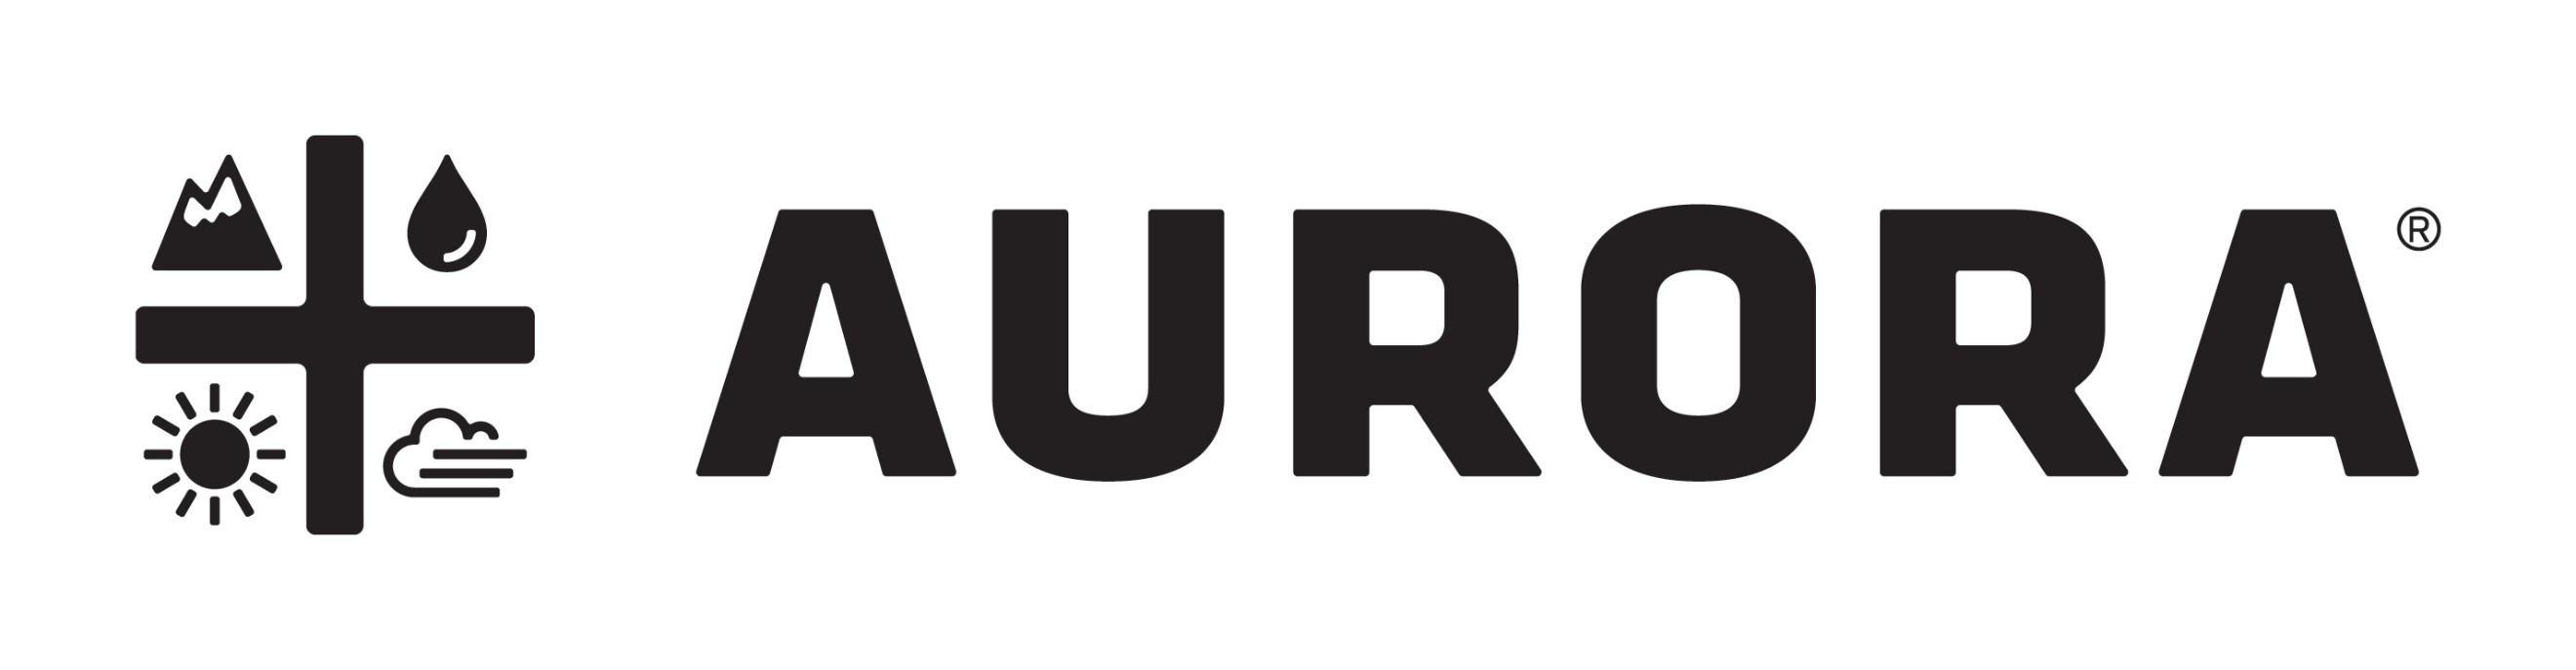 Aurora Cannabis Announces Financial Results for the Third Quarter of